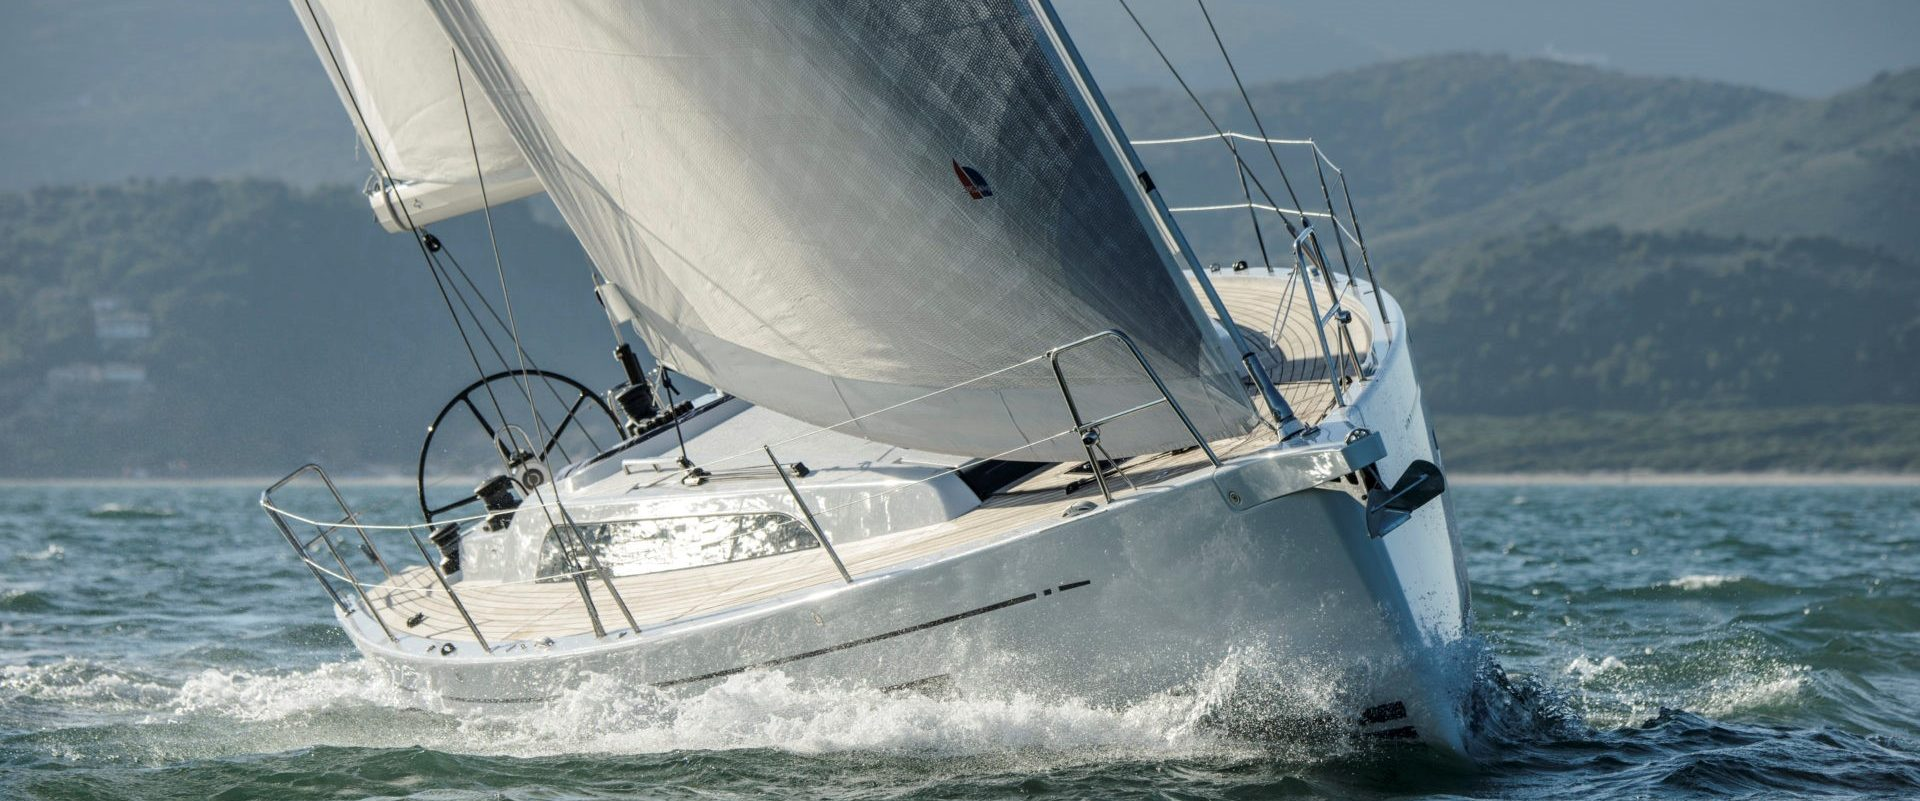 Buy x-yachts